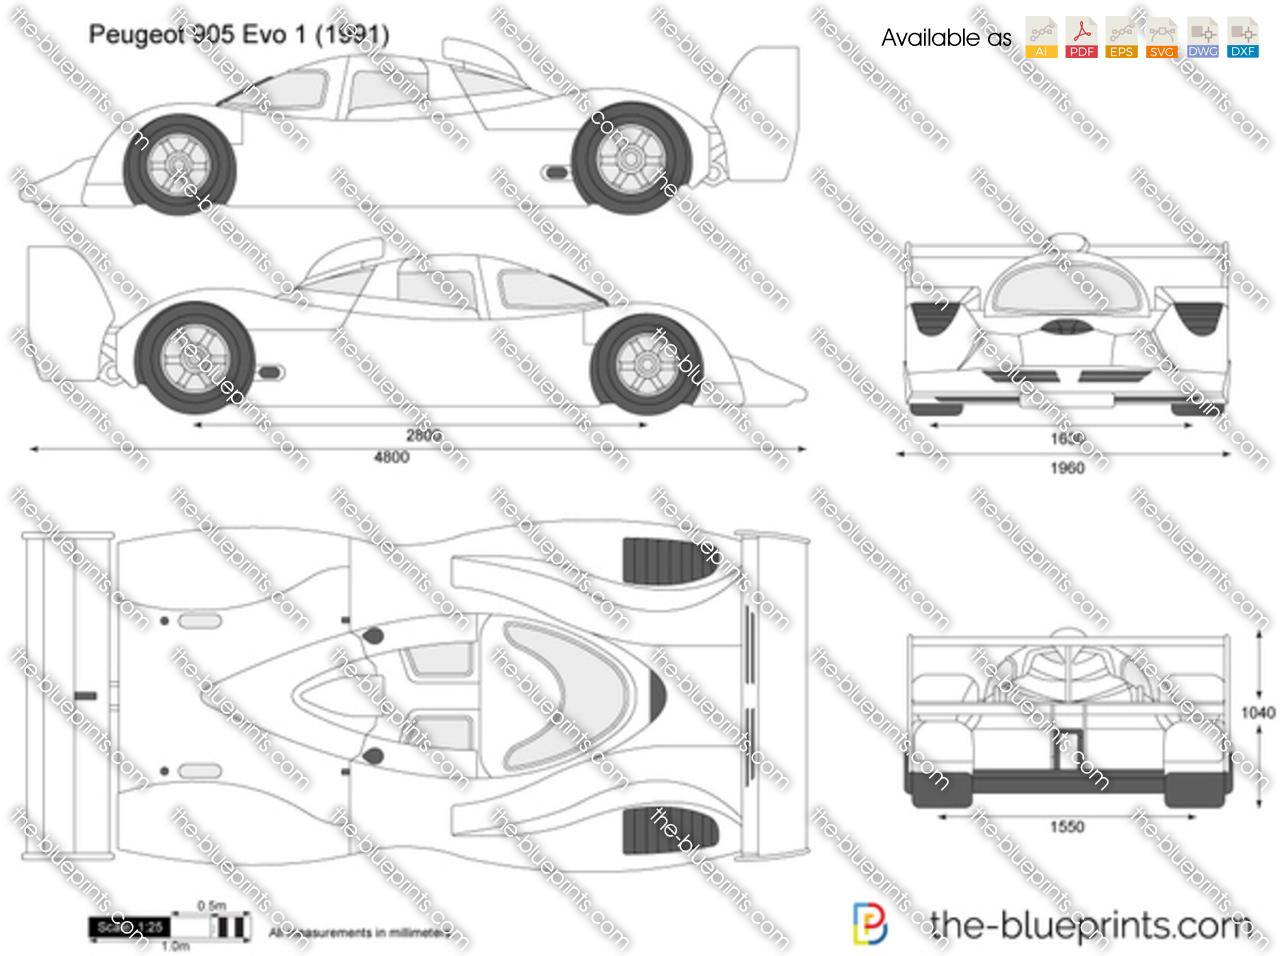 Peugeot 905 Evo 1 Vector Drawing